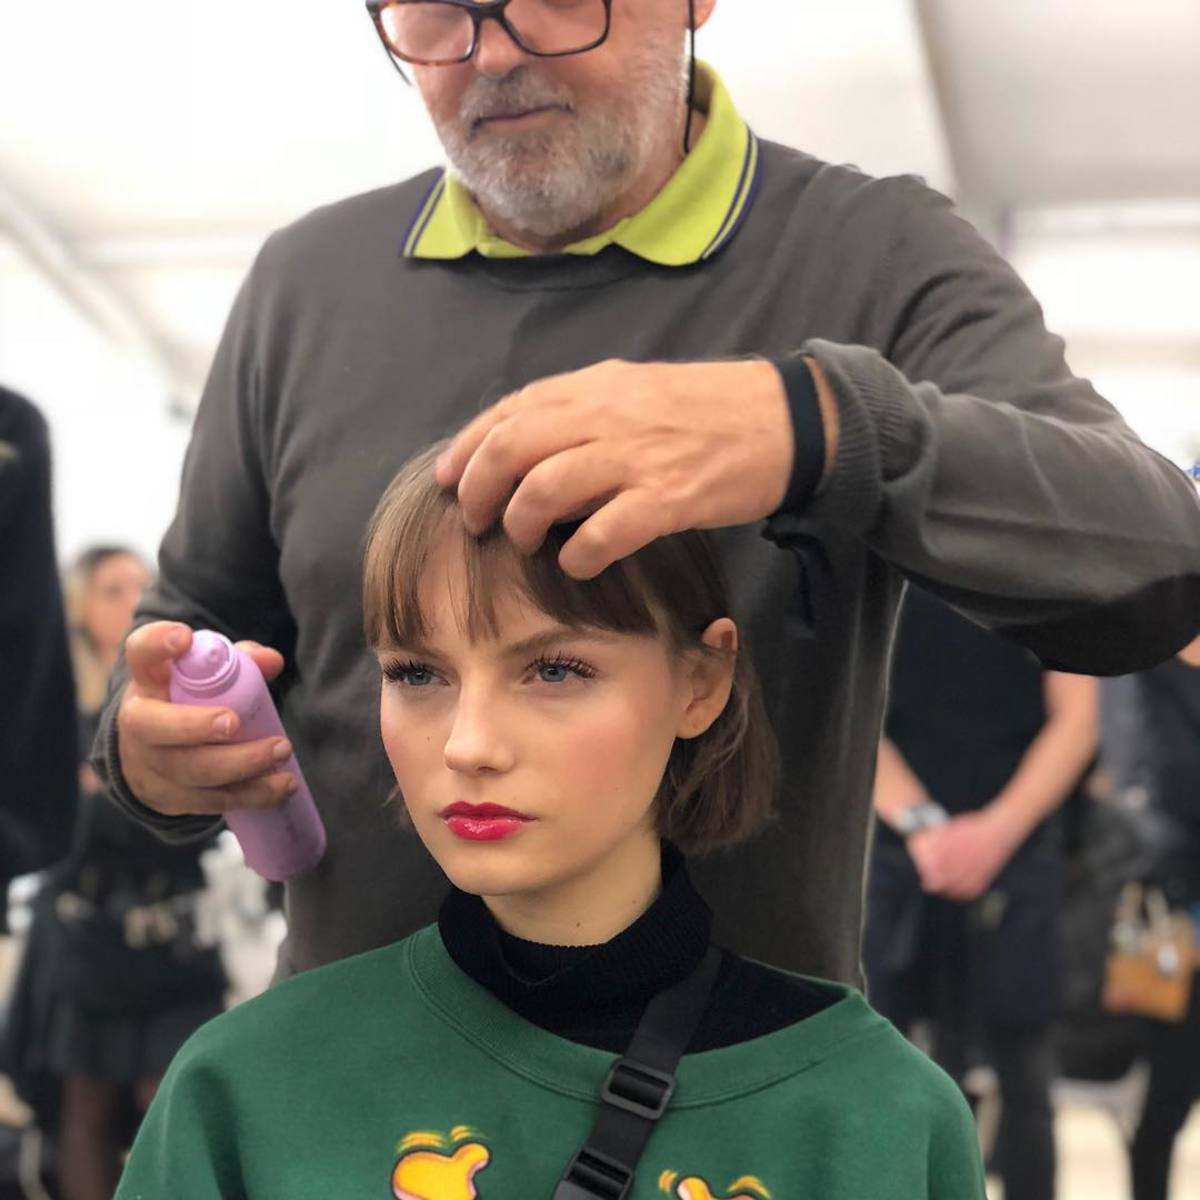 Sam McKnight styling Francesca Summers' hair backstage. Photo: @hairbysammcknight/Instagram